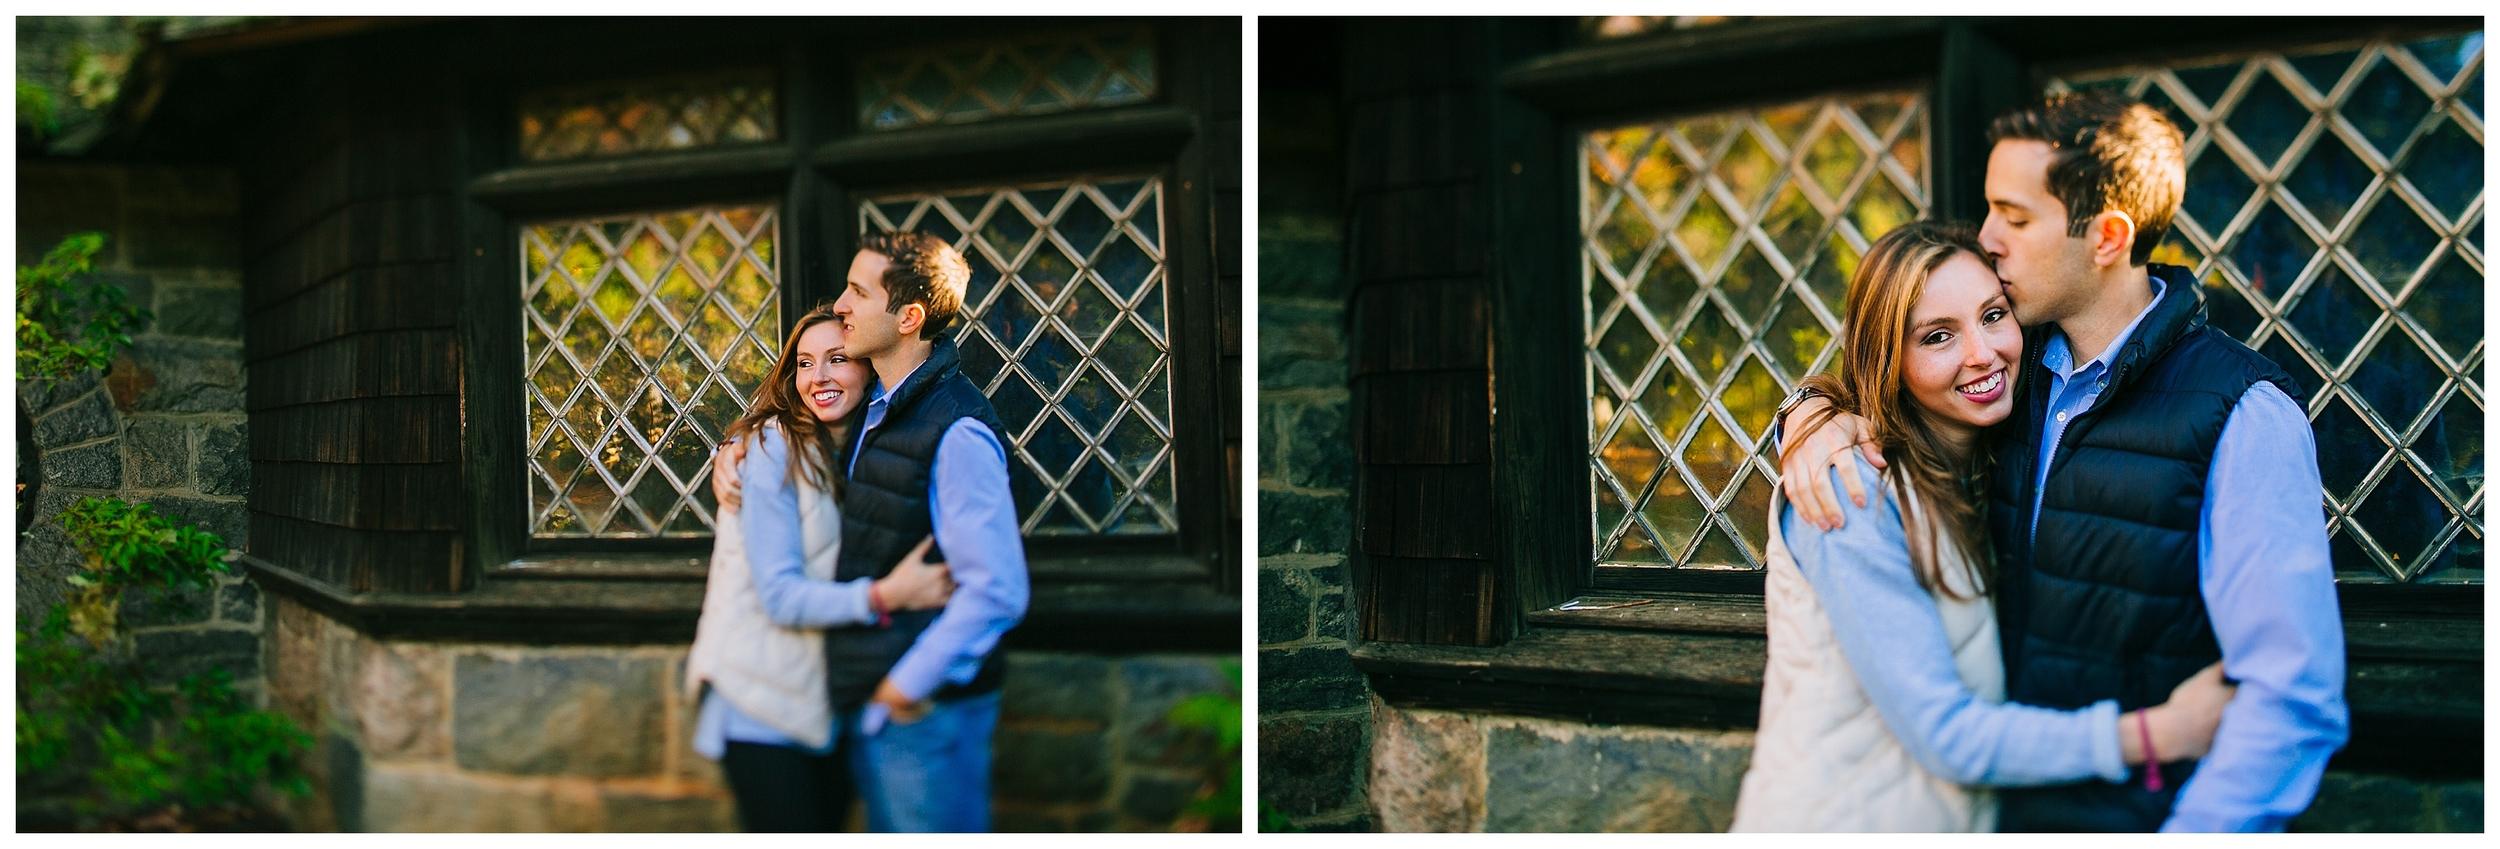 Skylands Manor Fall Engagement Photos